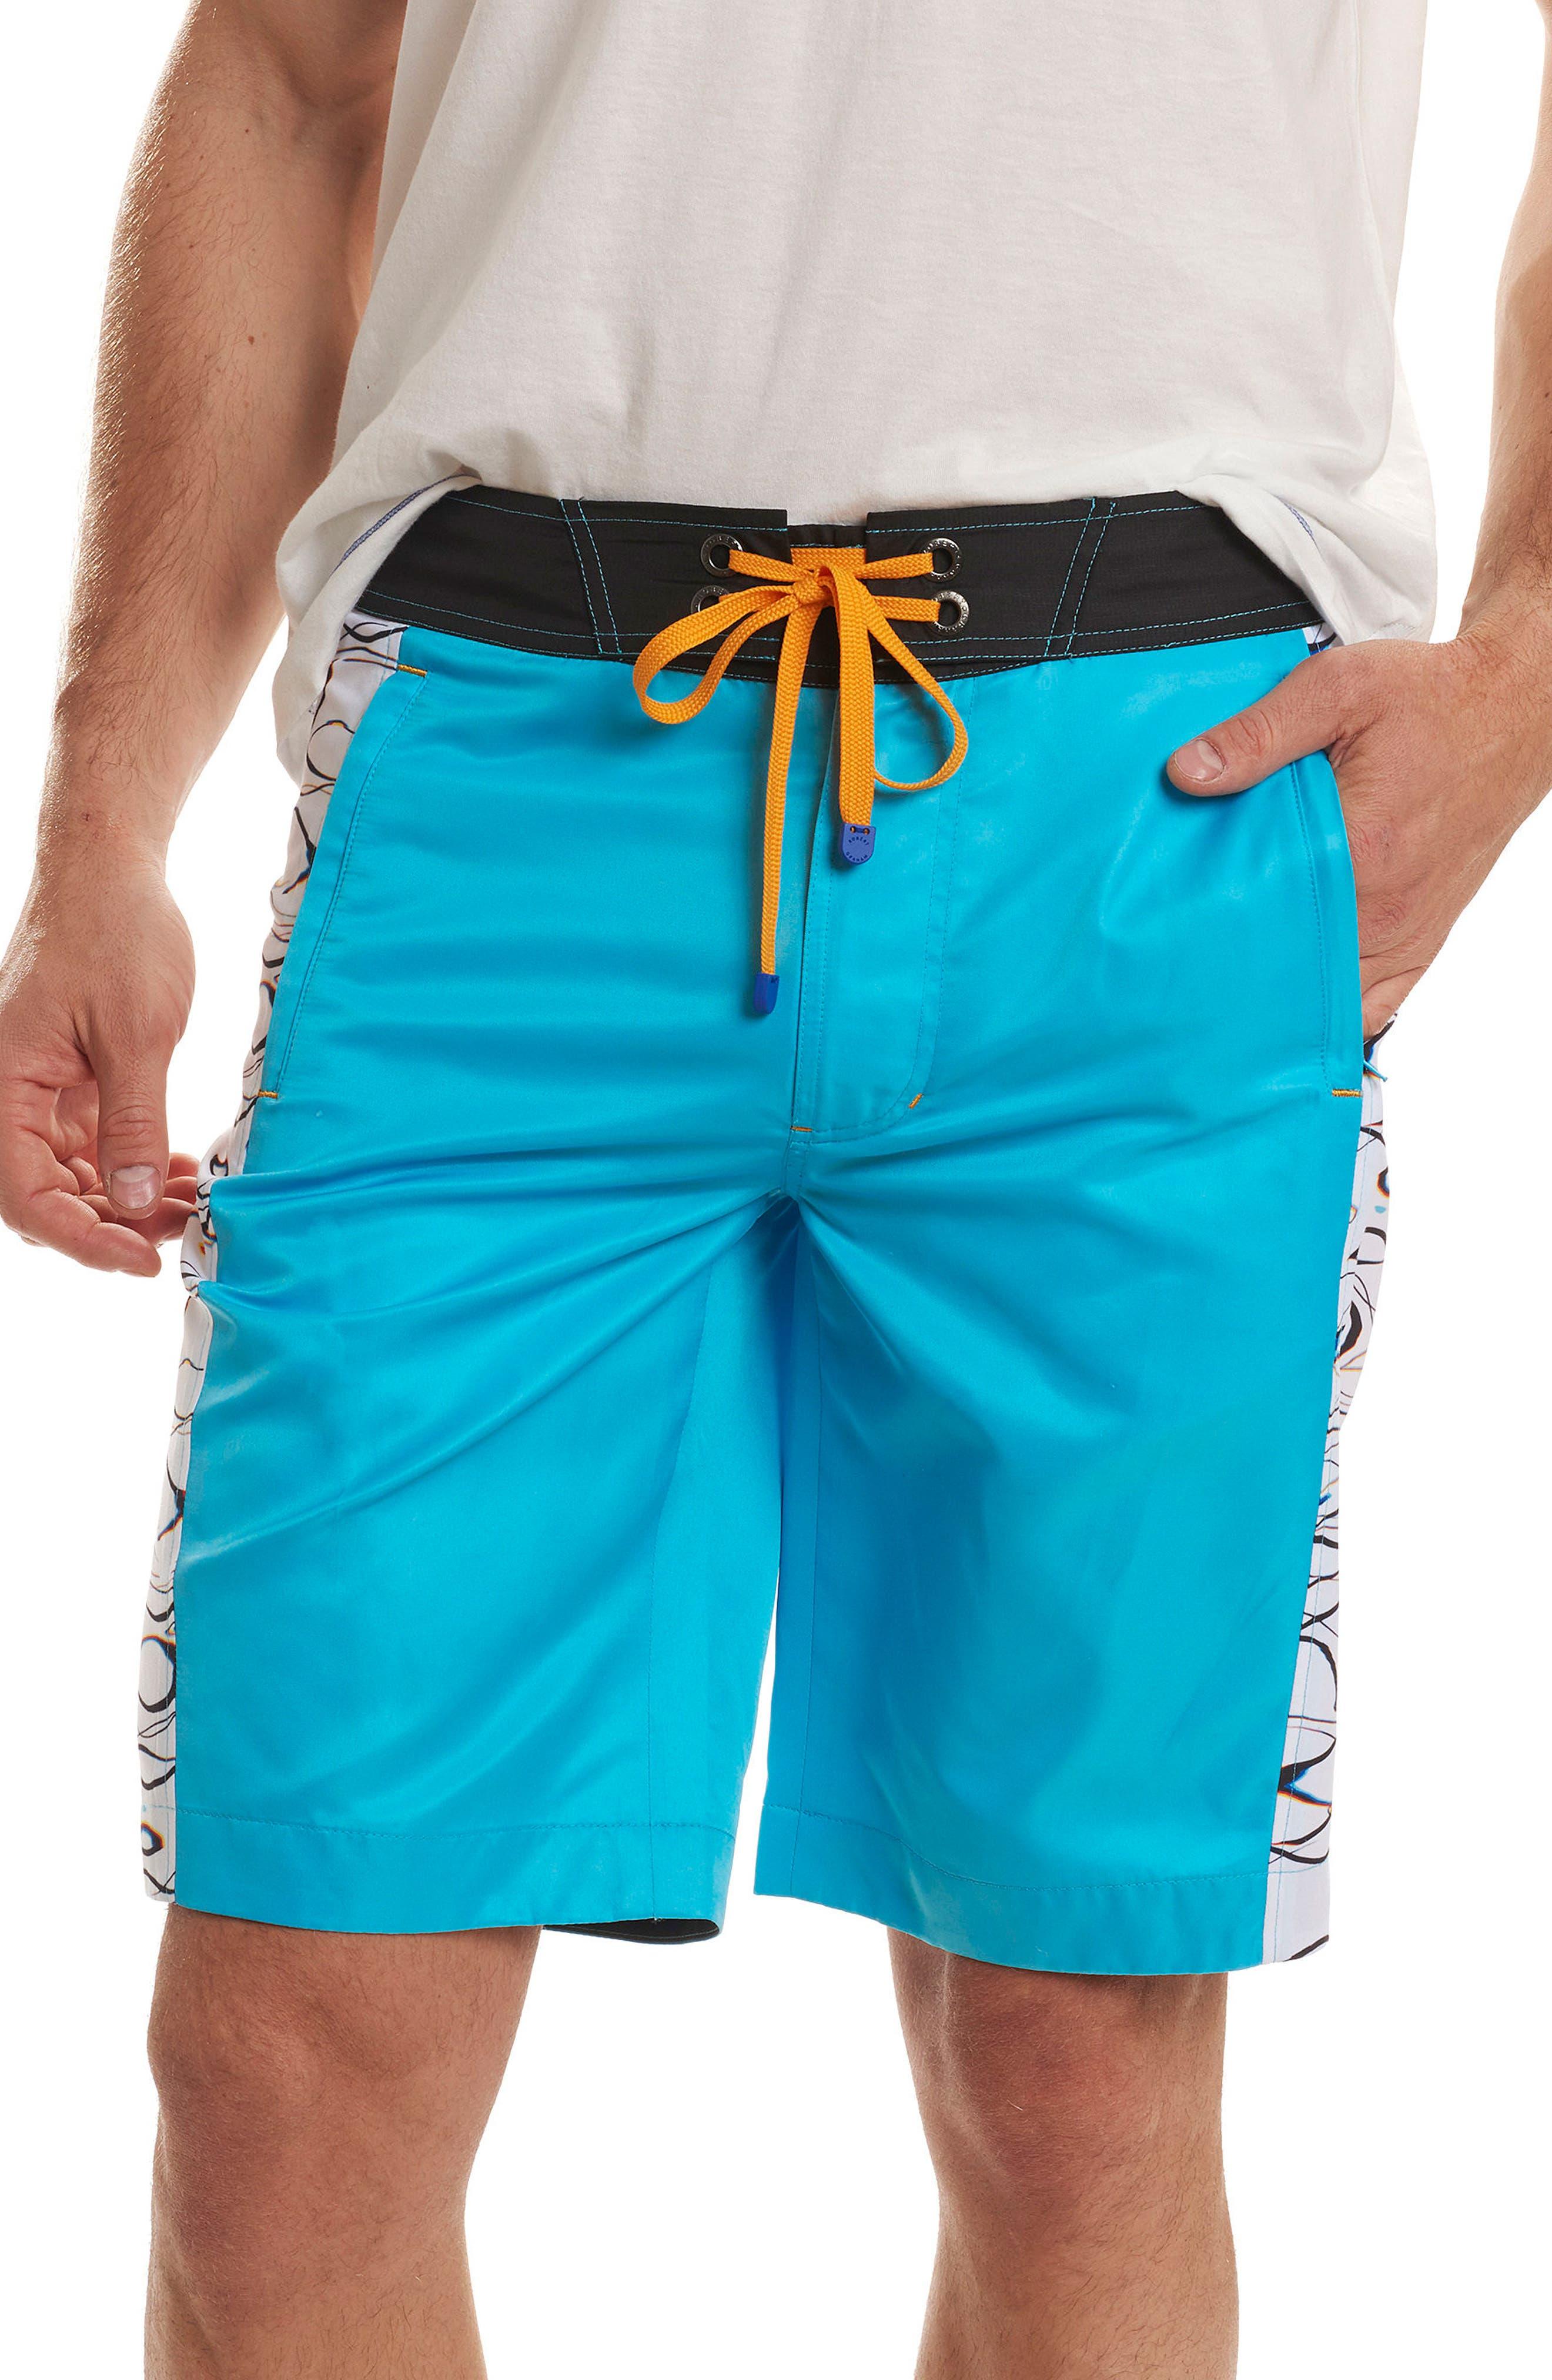 Maili Classic Fit Swim Trunks,                         Main,                         color, Aqua